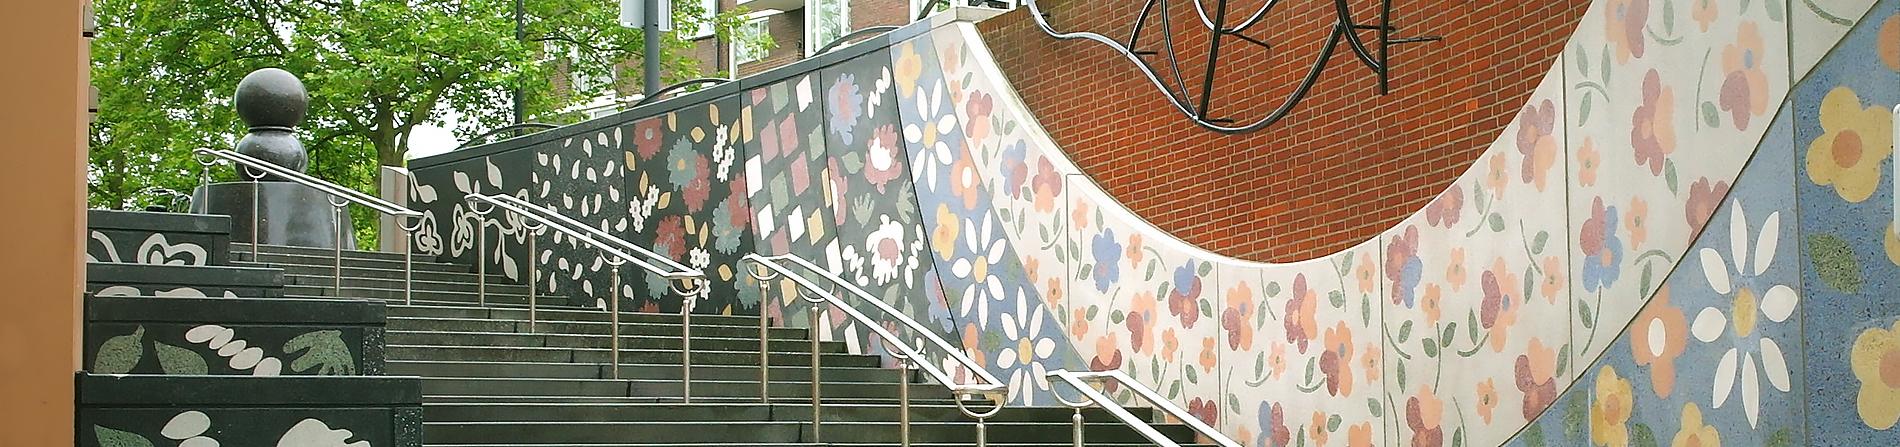 stadshart_vlaardingen_spaanse_trappen